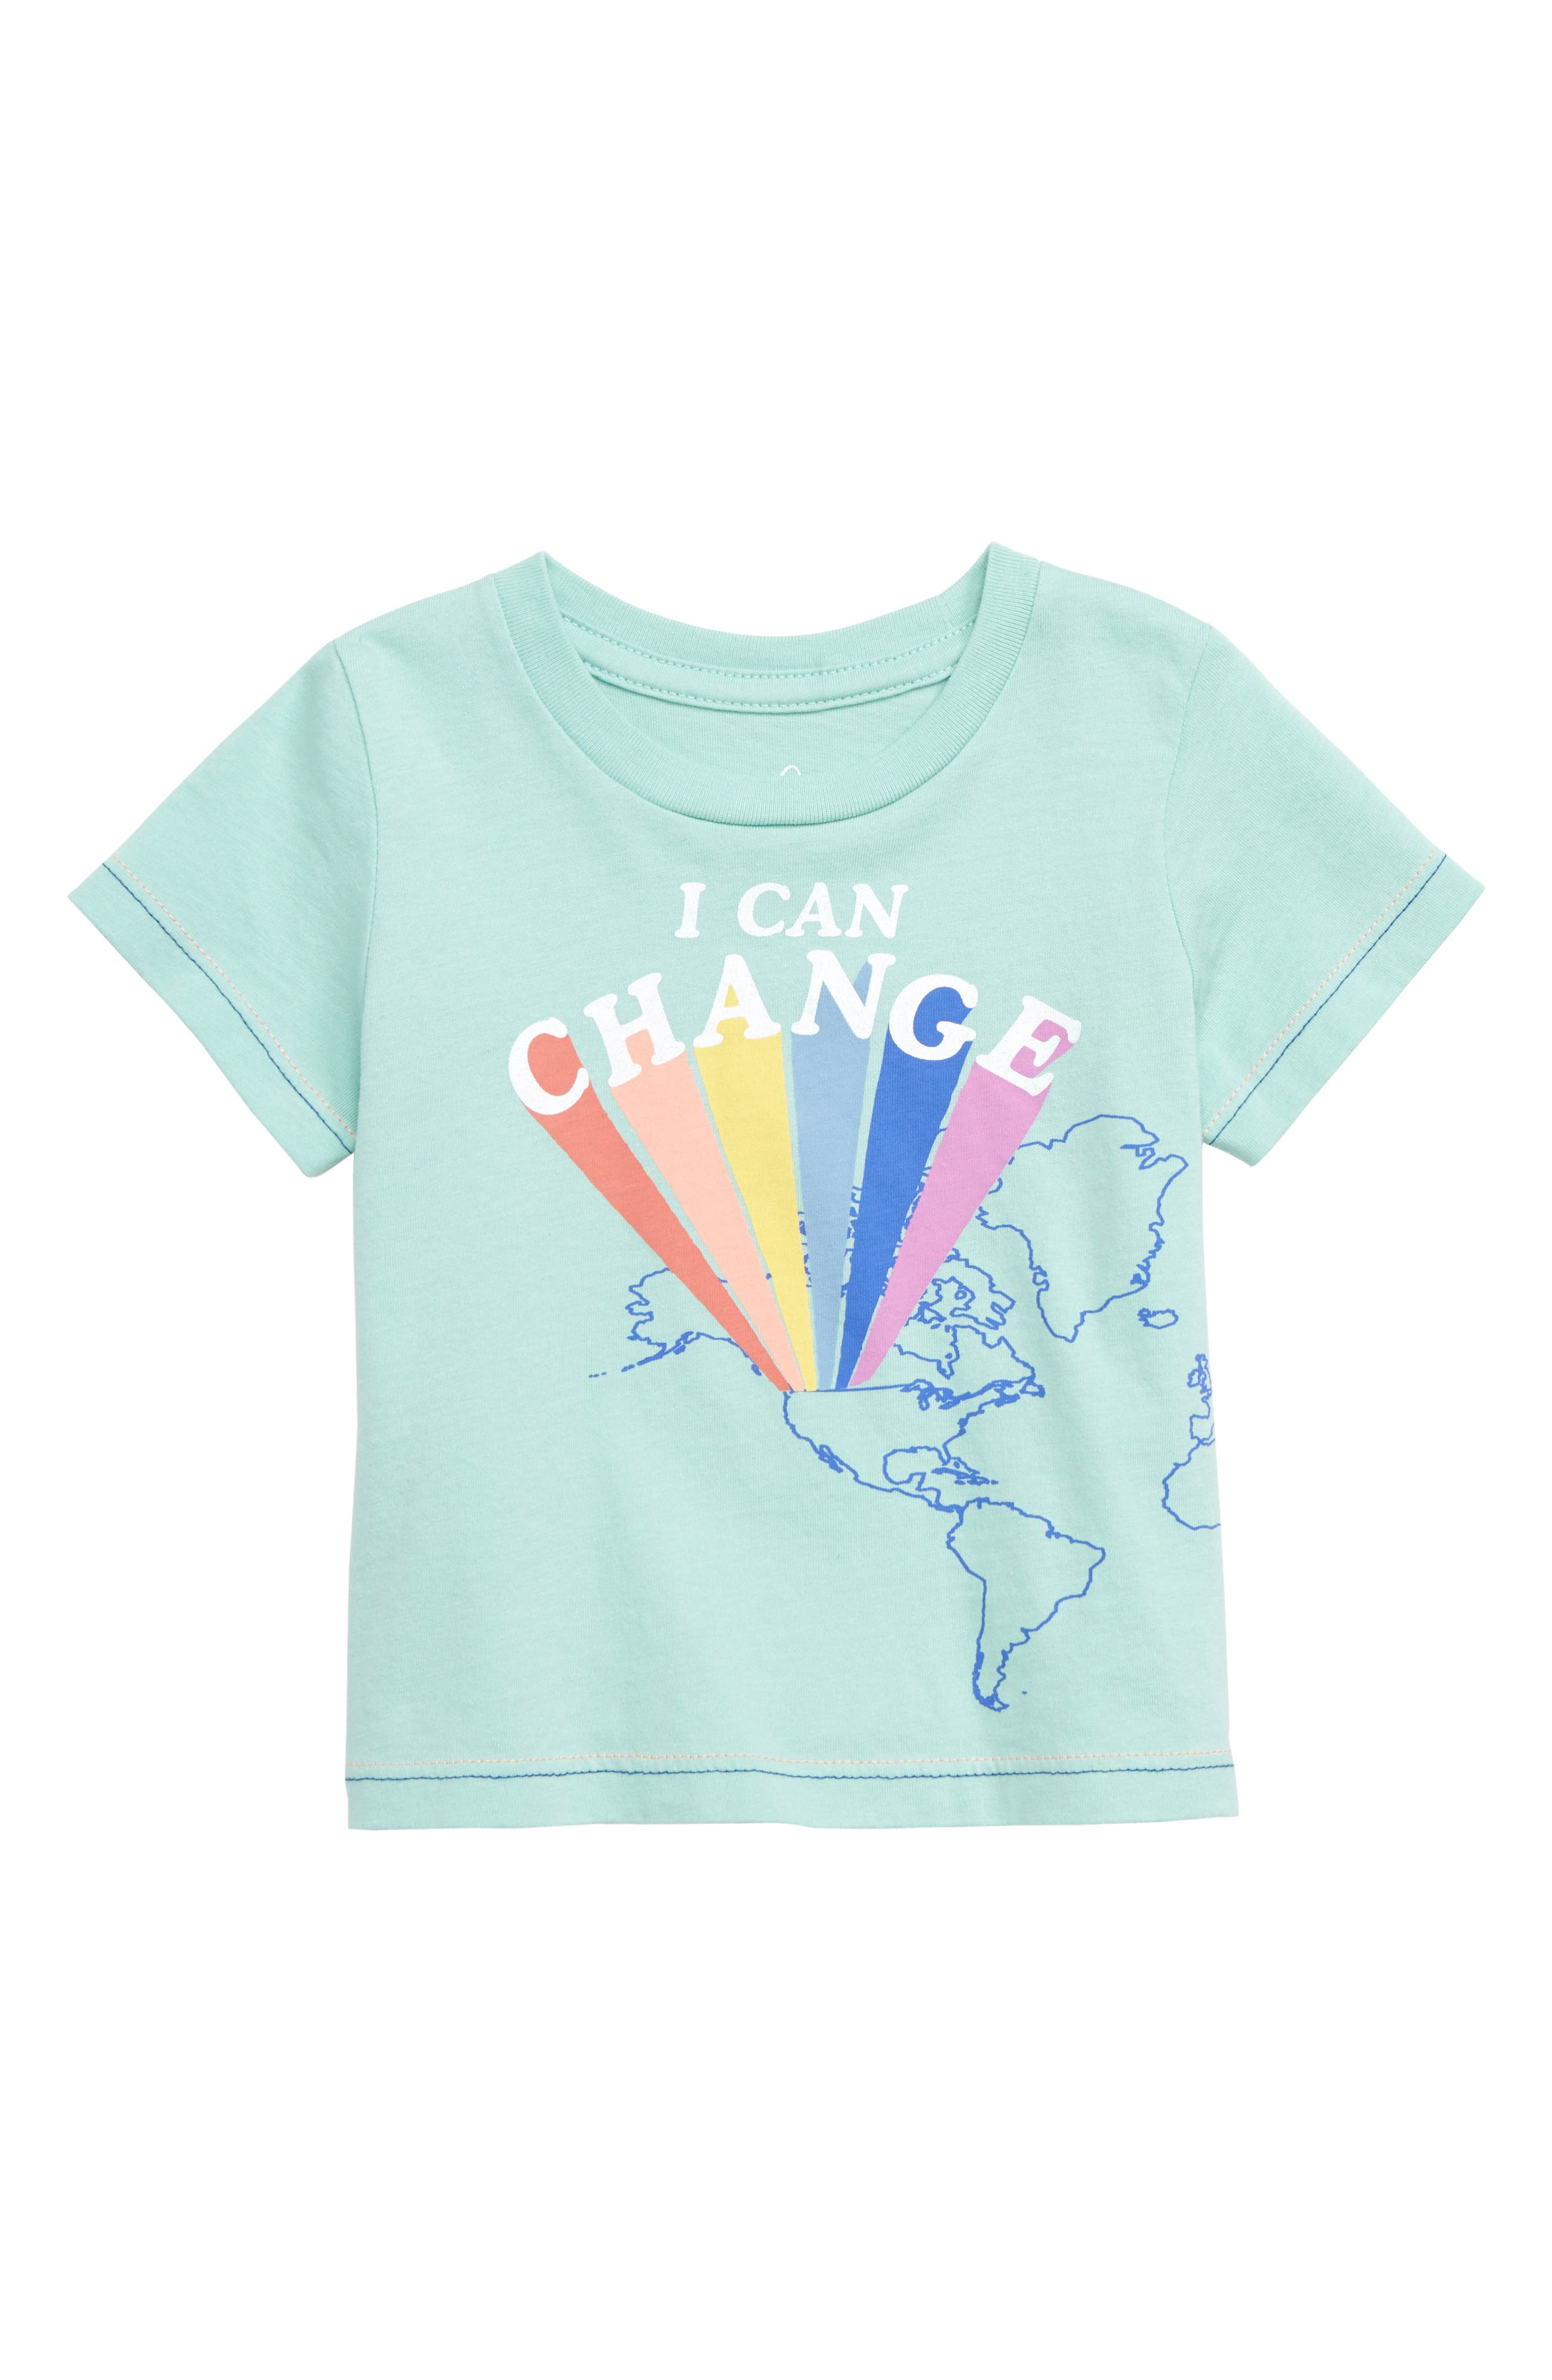 PEEK ESSENTIALS Peek Change the World Graphic T-Shirt, Main, color, BLUE